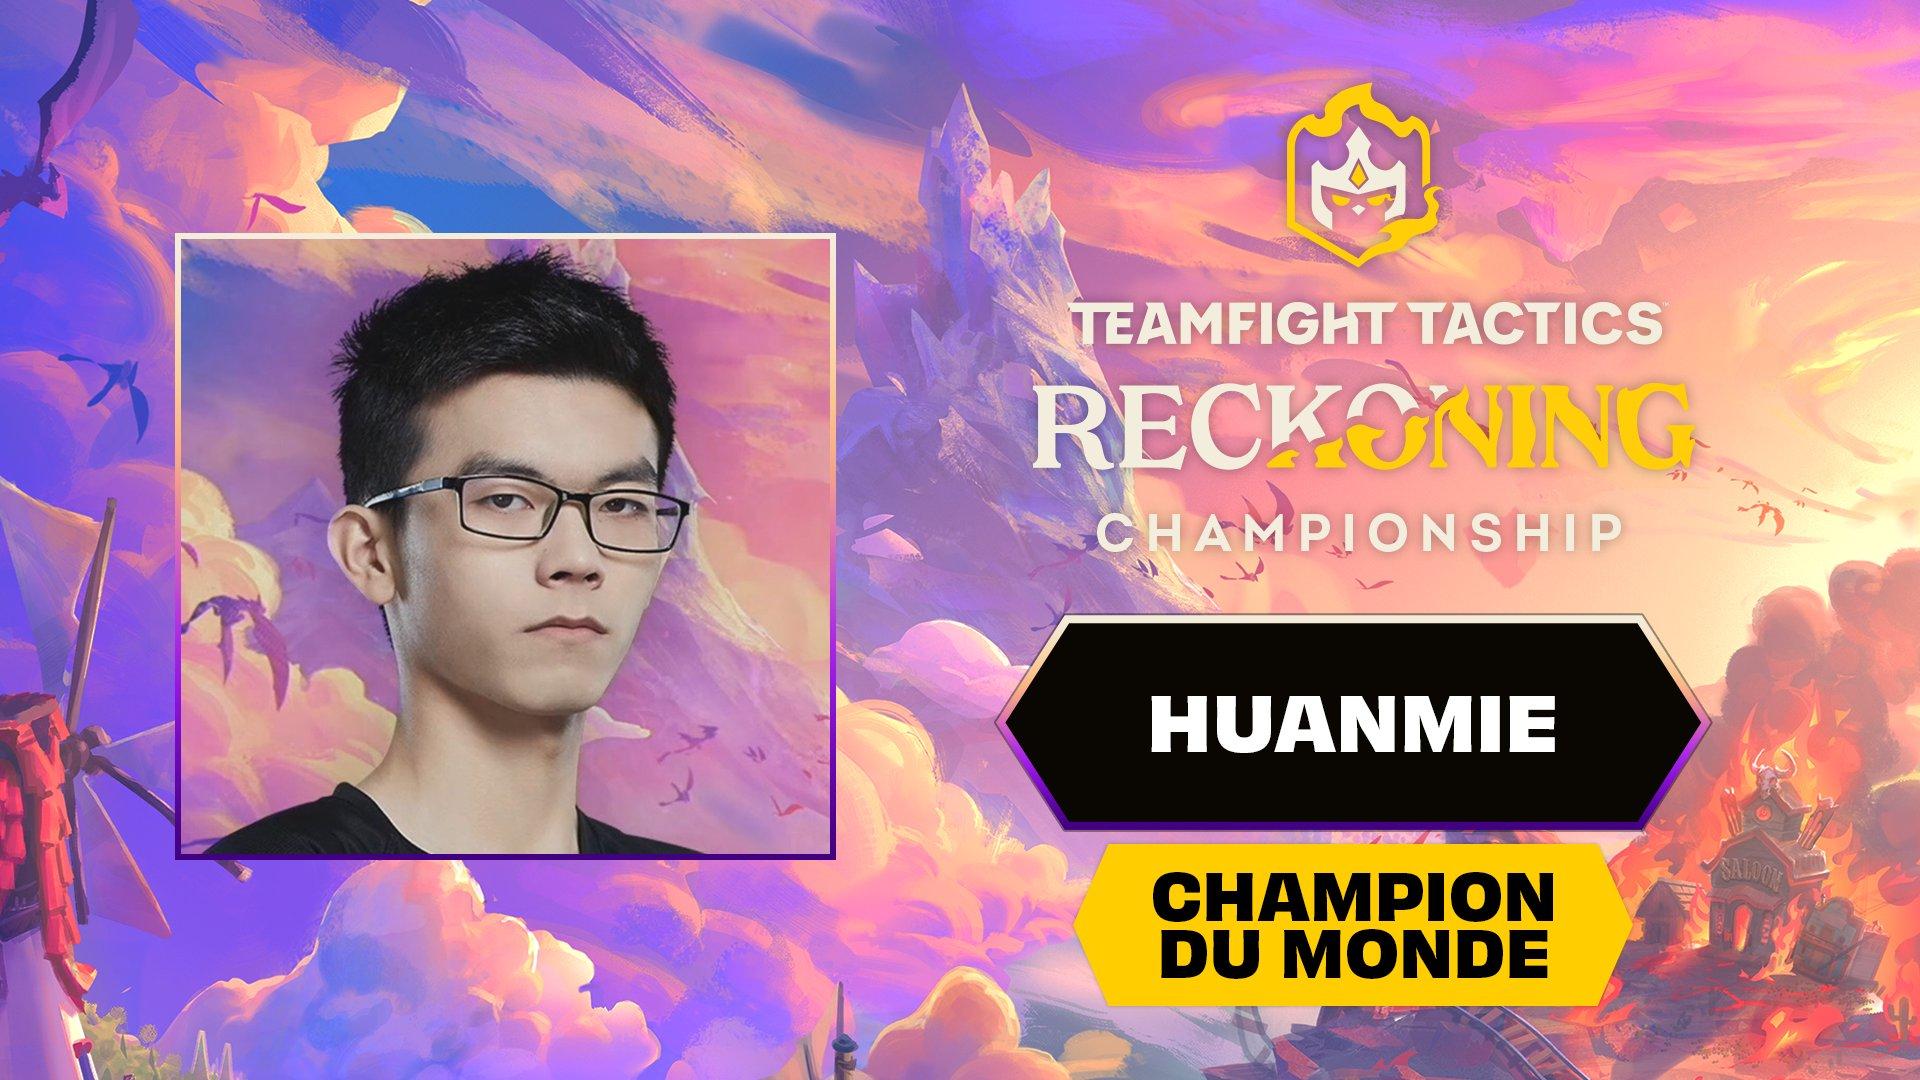 huanmie champion worlds tft jugement